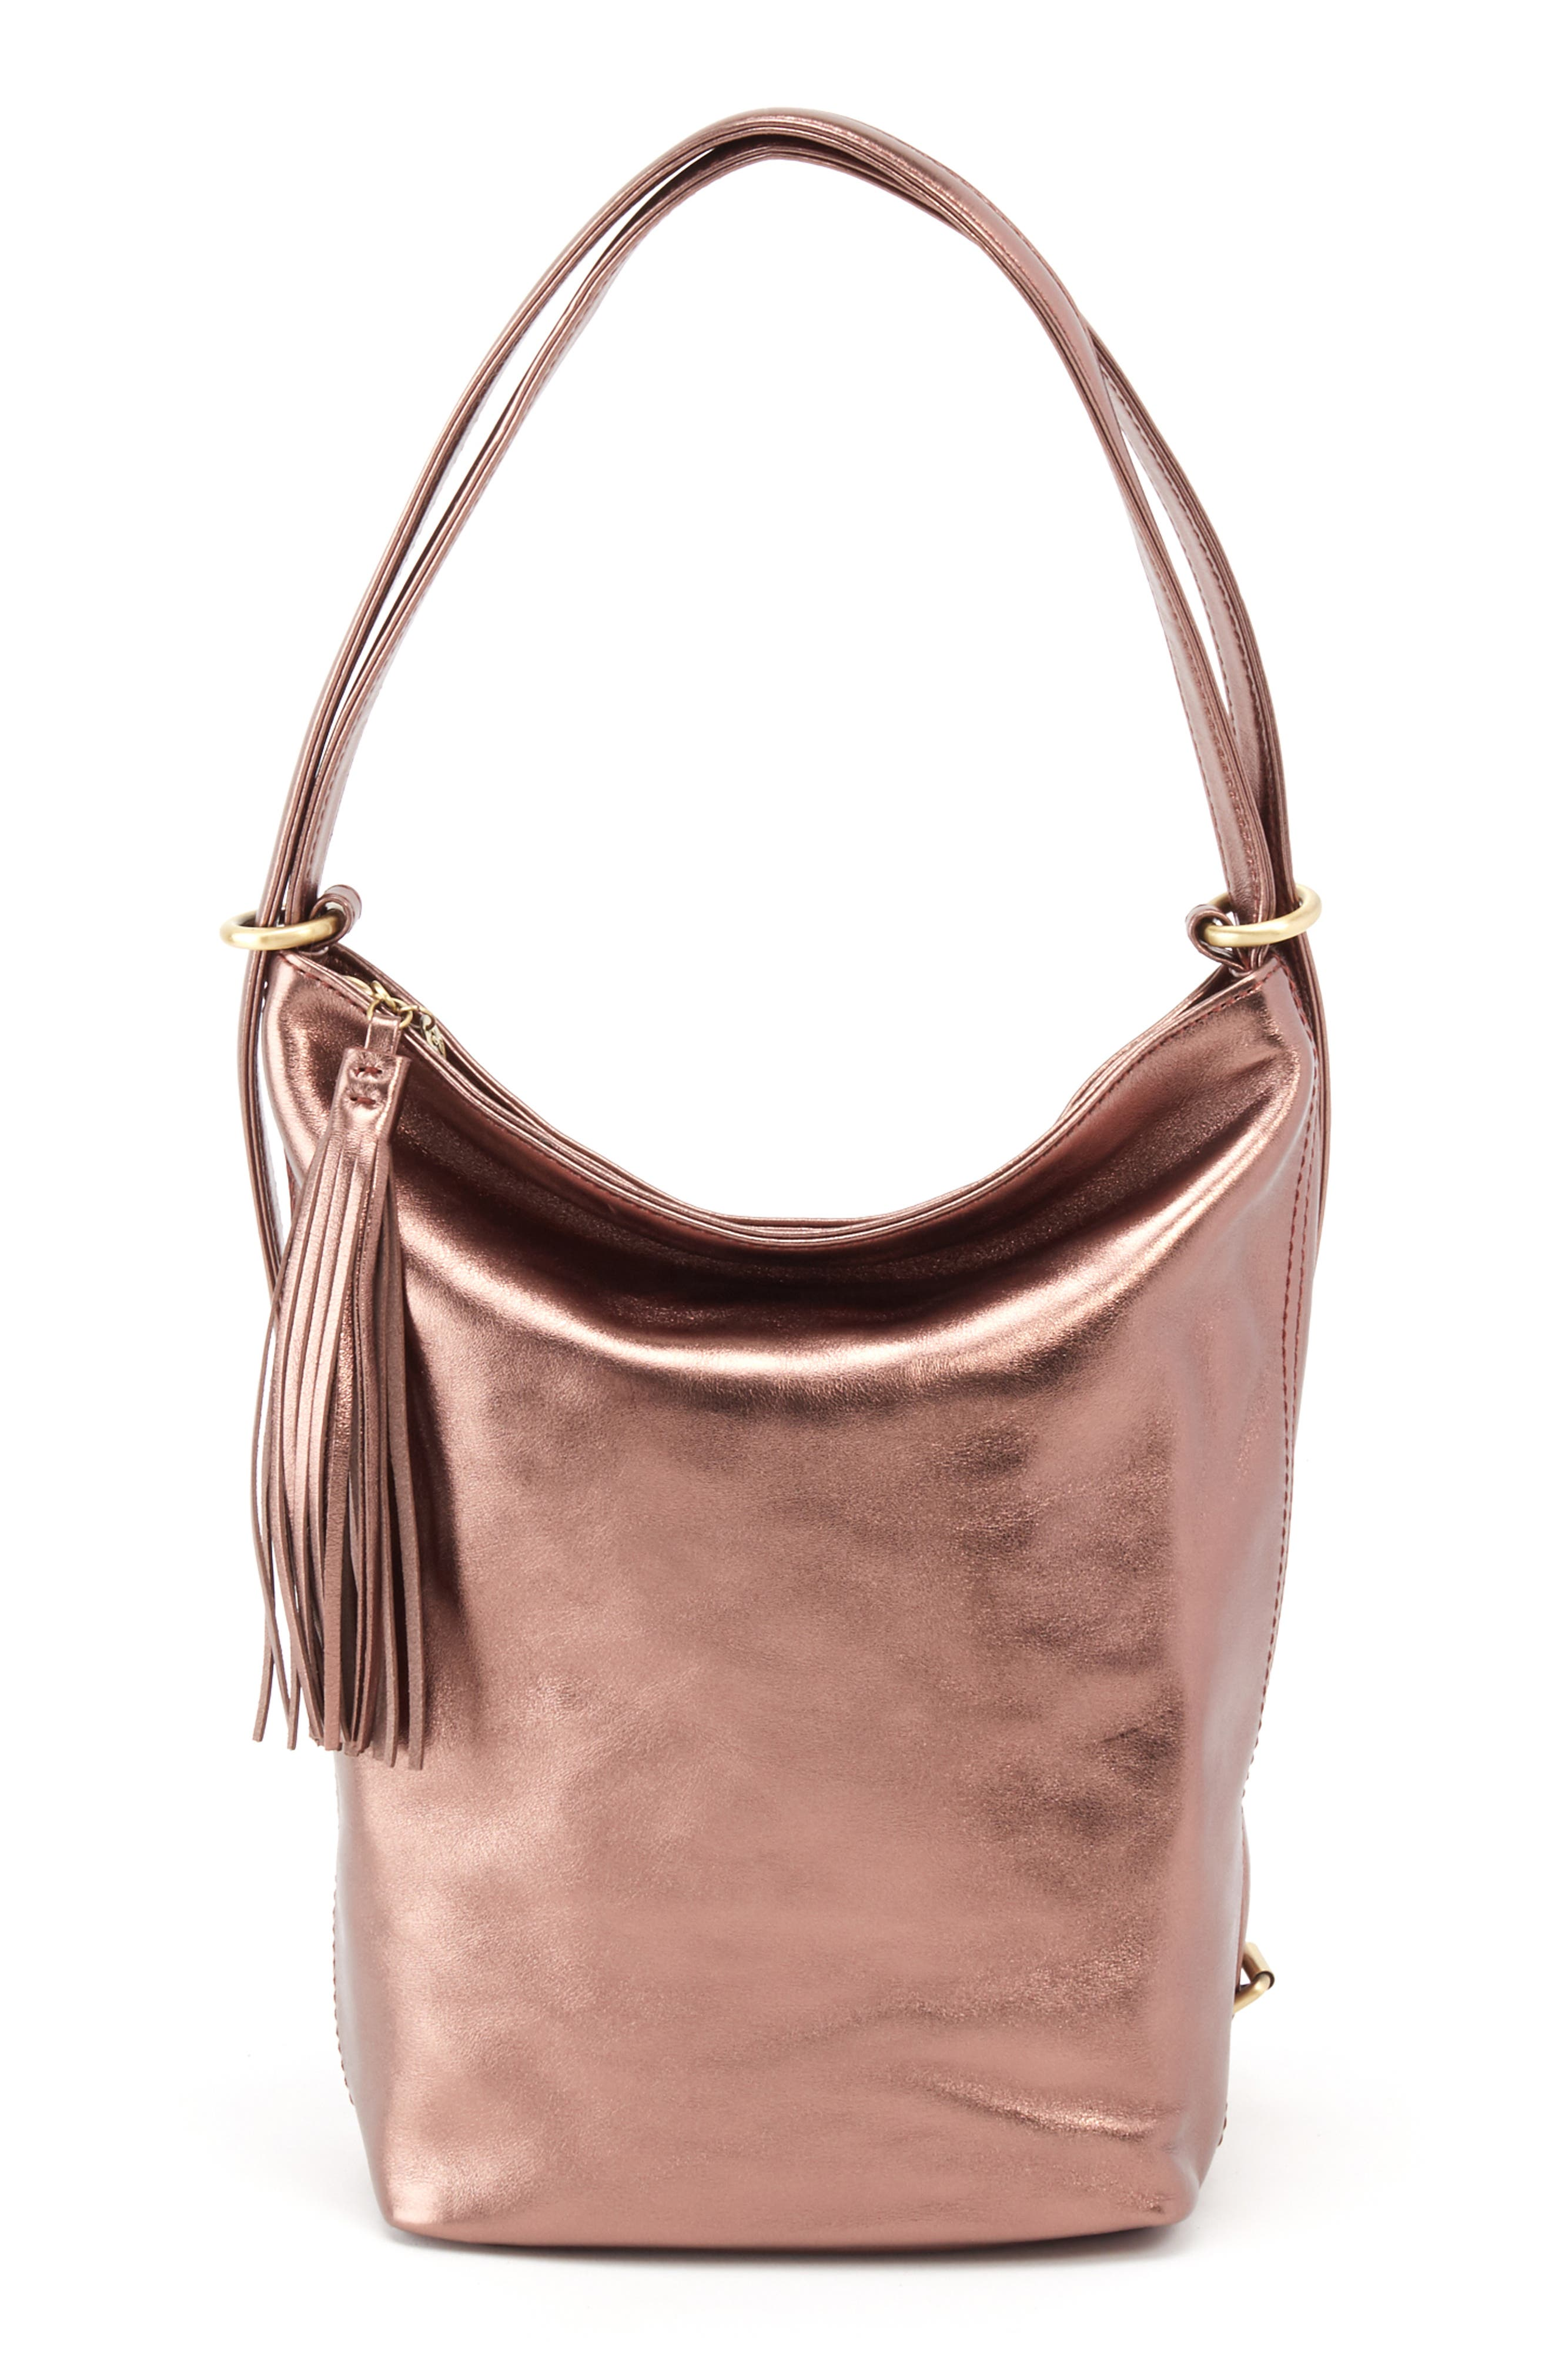 Blaze Convertible Shoulder Bag,                             Main thumbnail 1, color,                             246